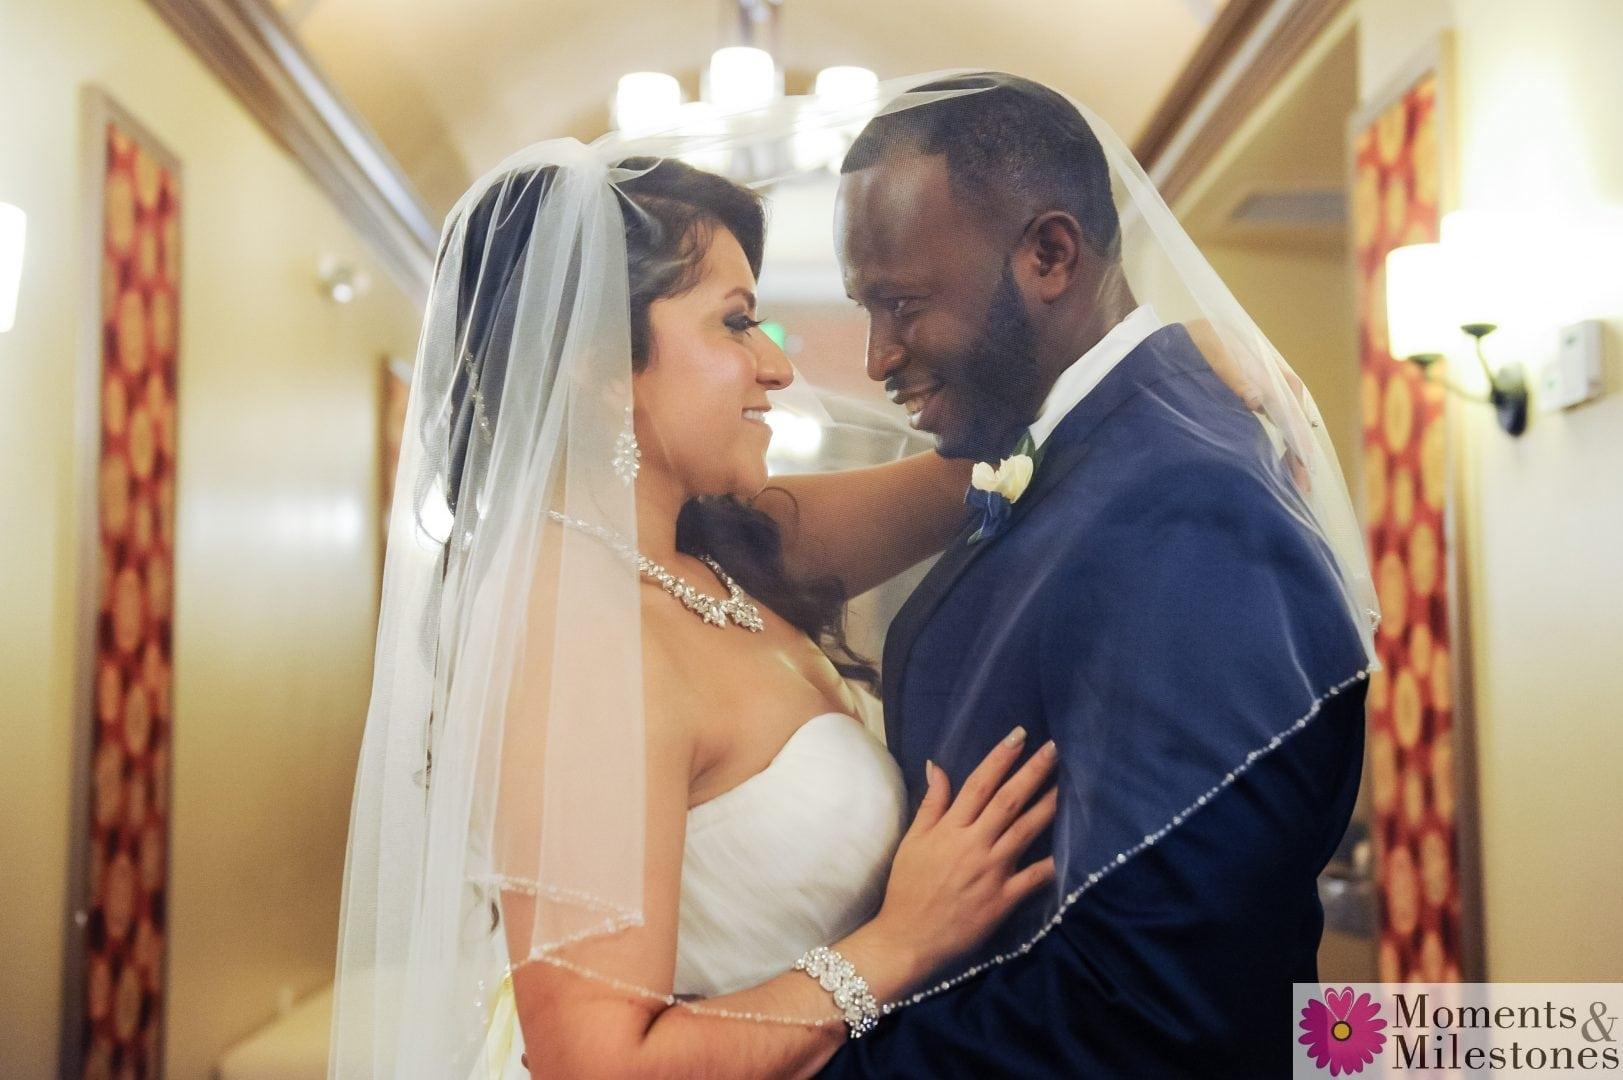 San Antonio Noah's Event Center Wedding Planning and Wedding Photography